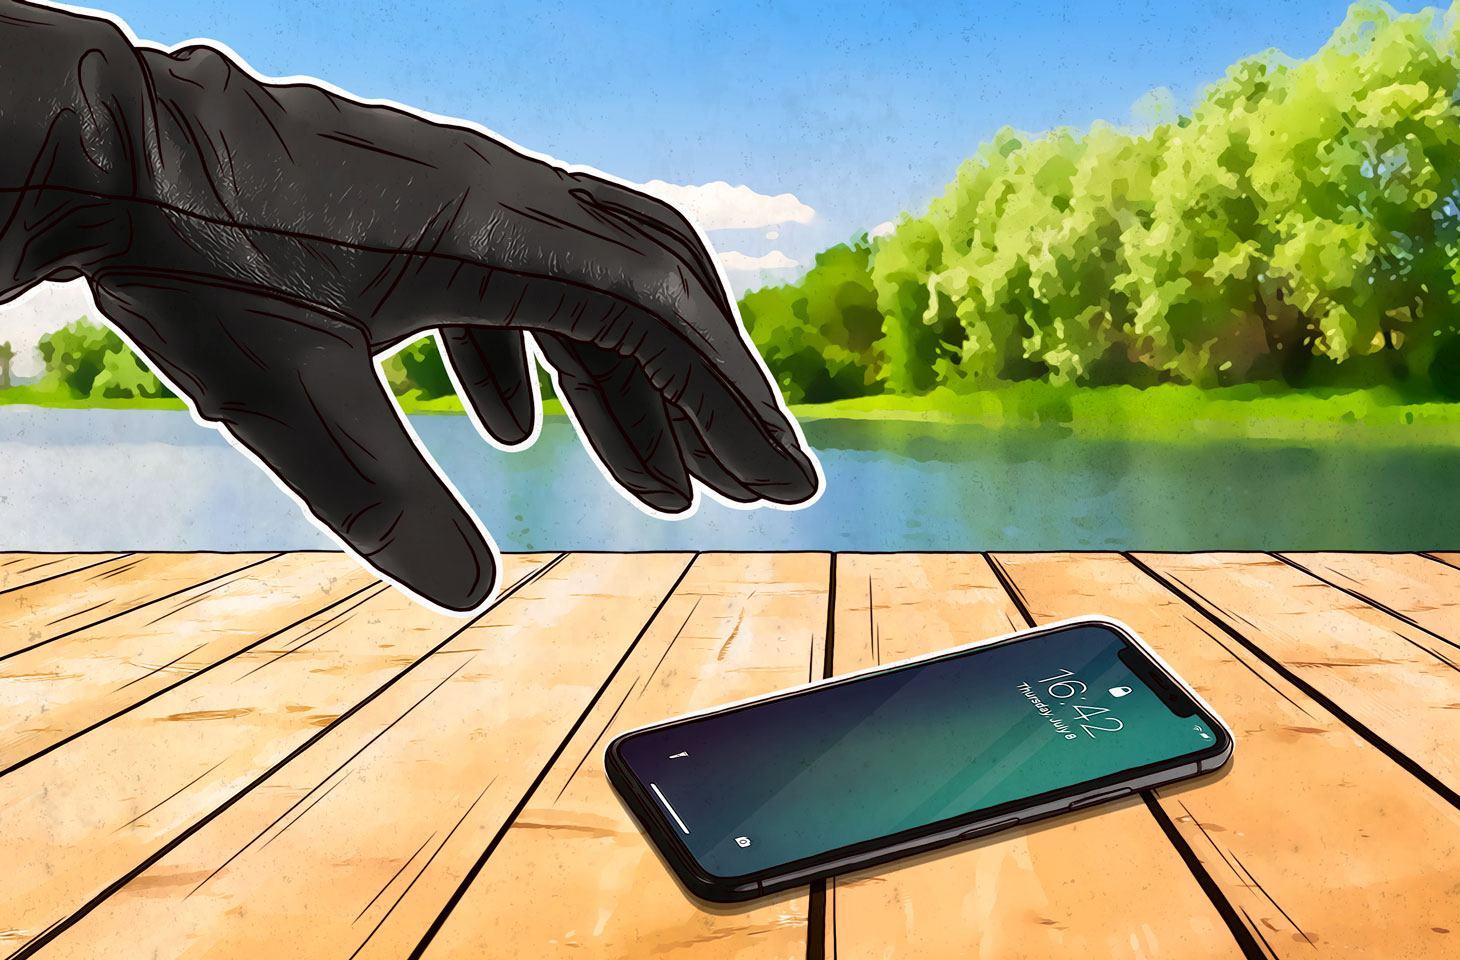 Телефон взял в кредит его украли и онлайн moneyman кредиты